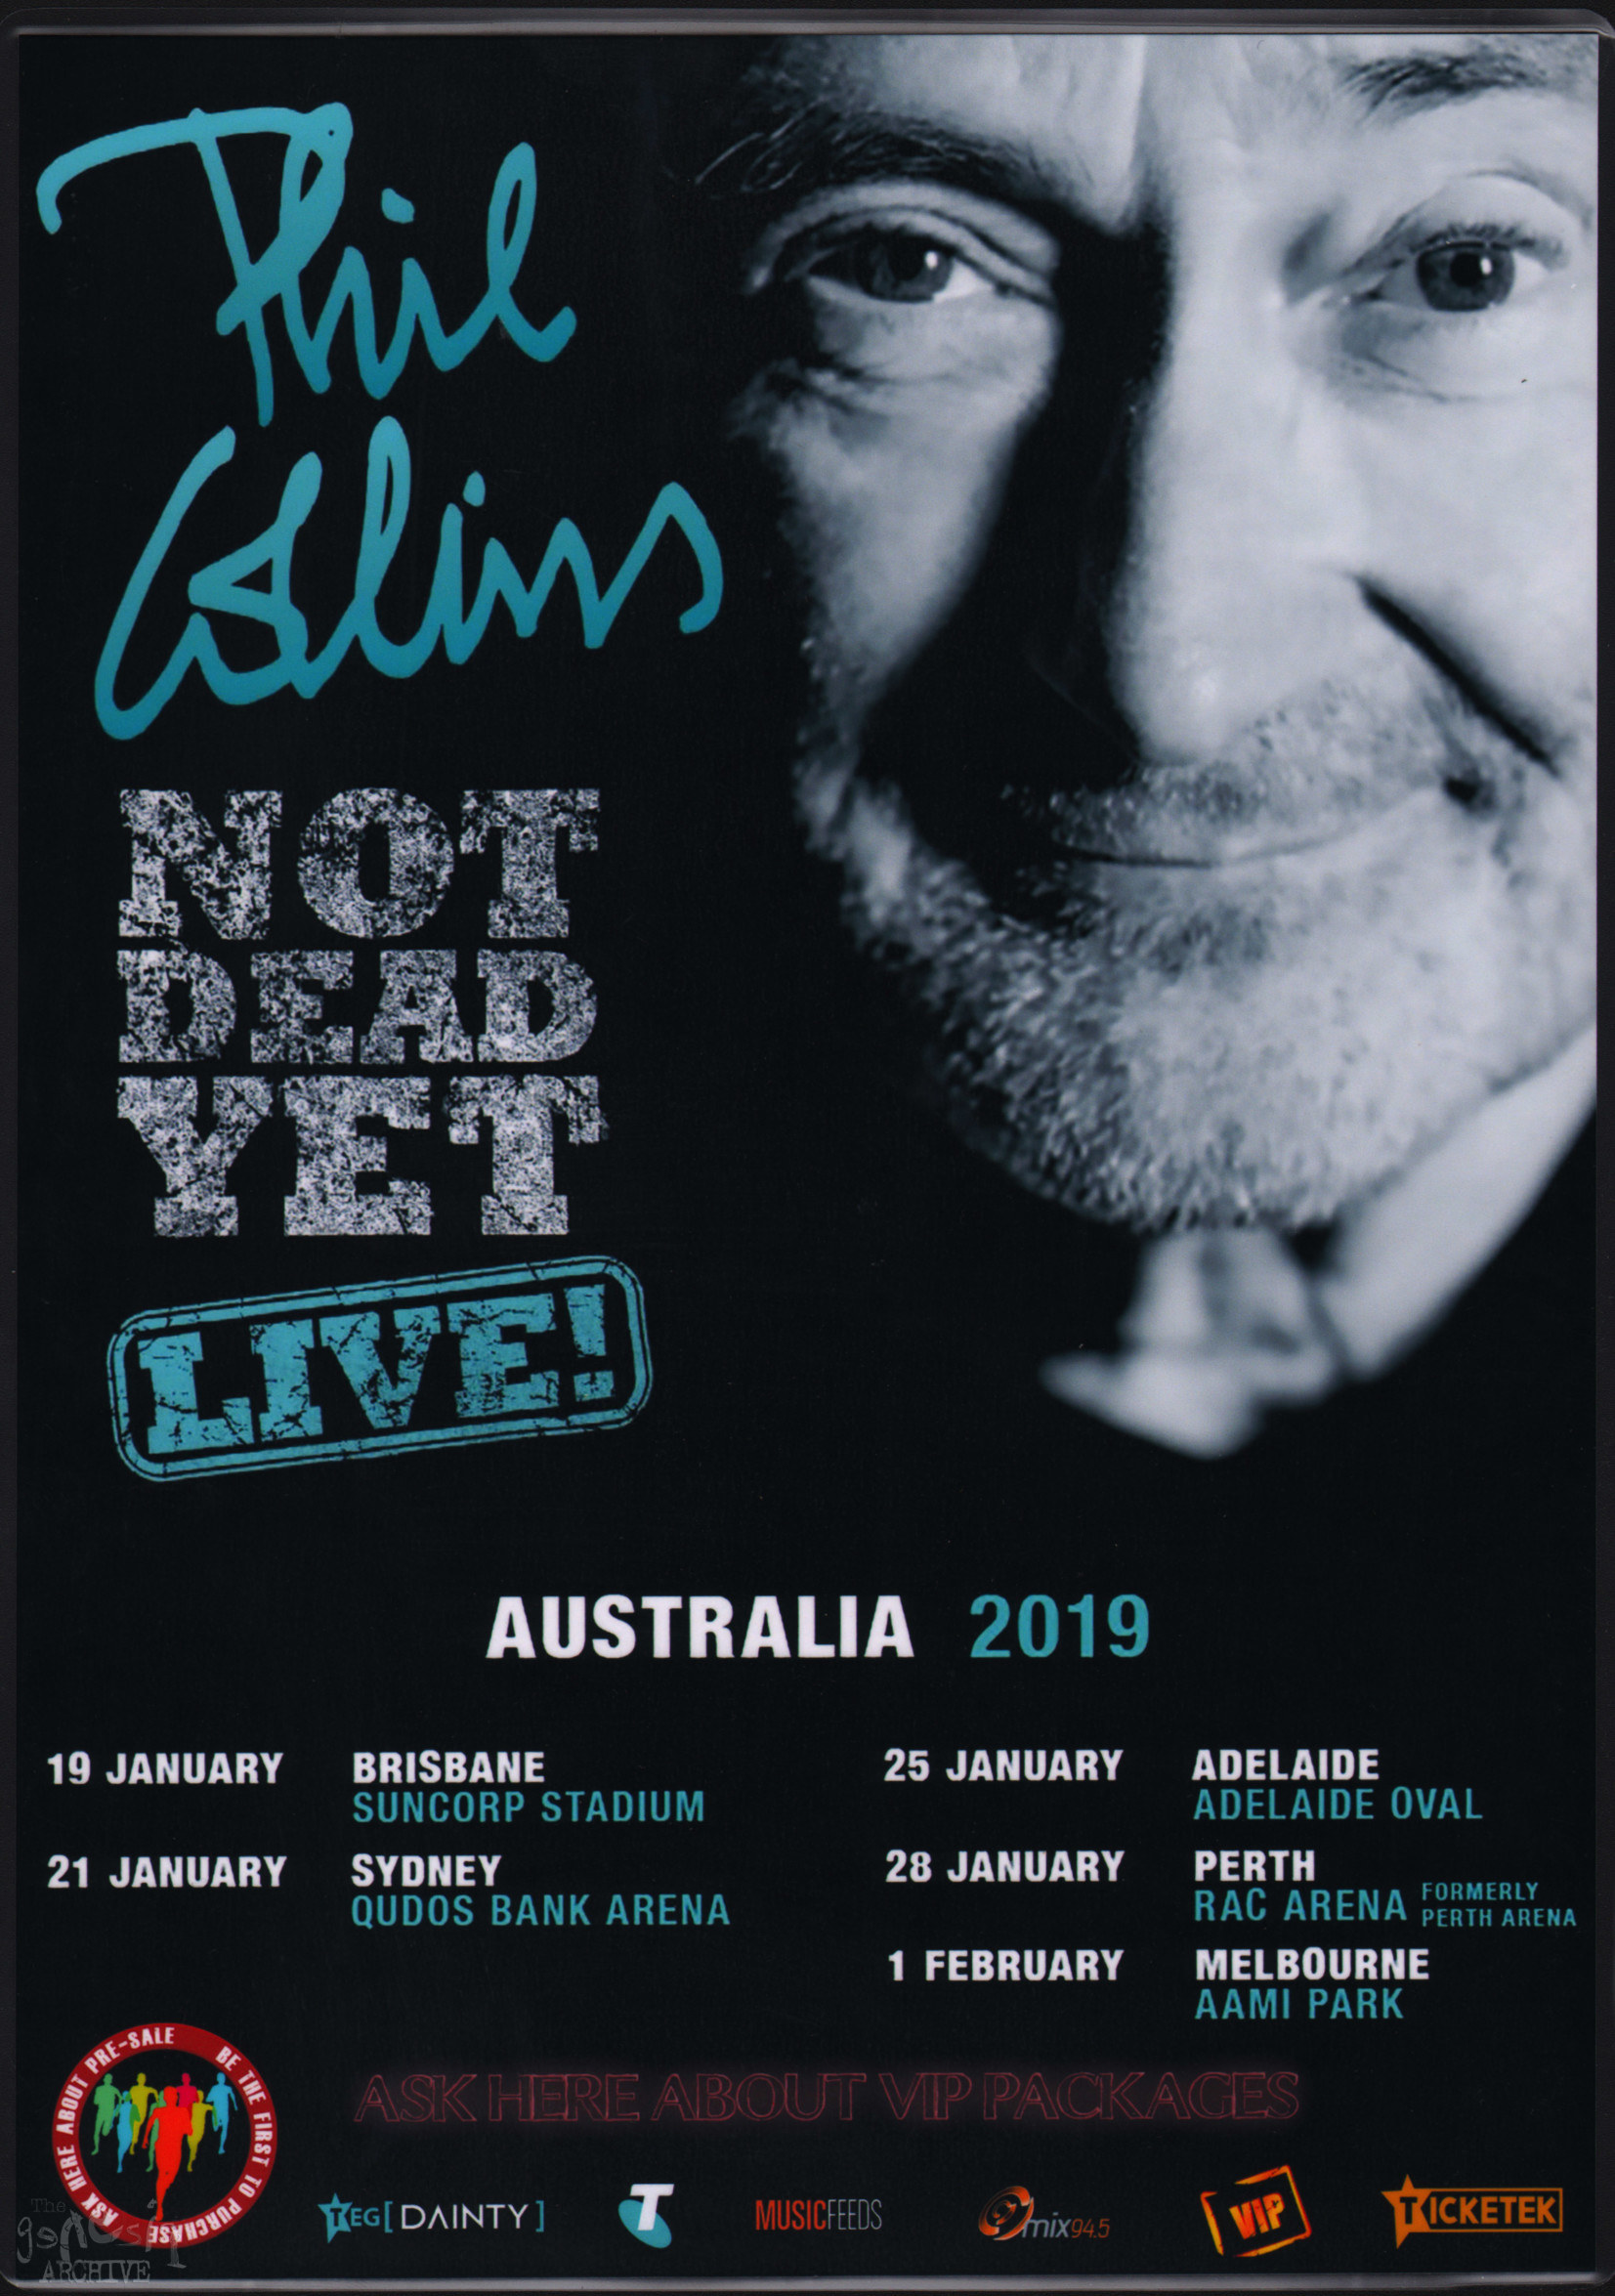 Drake concert dates 2019 in Australia